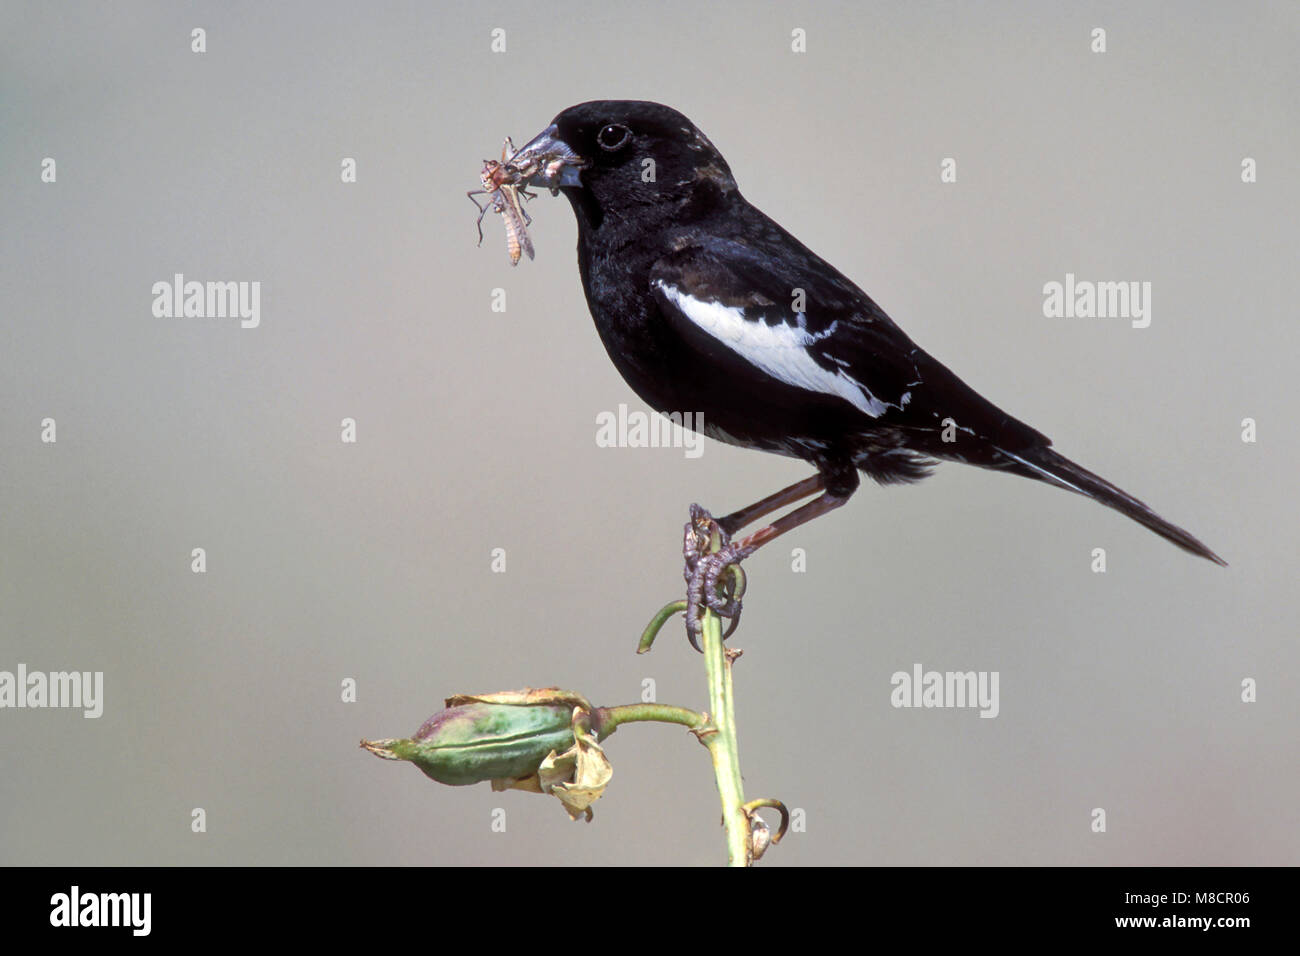 Adult male breeding Weld Co., CO June 2000 - Stock Image